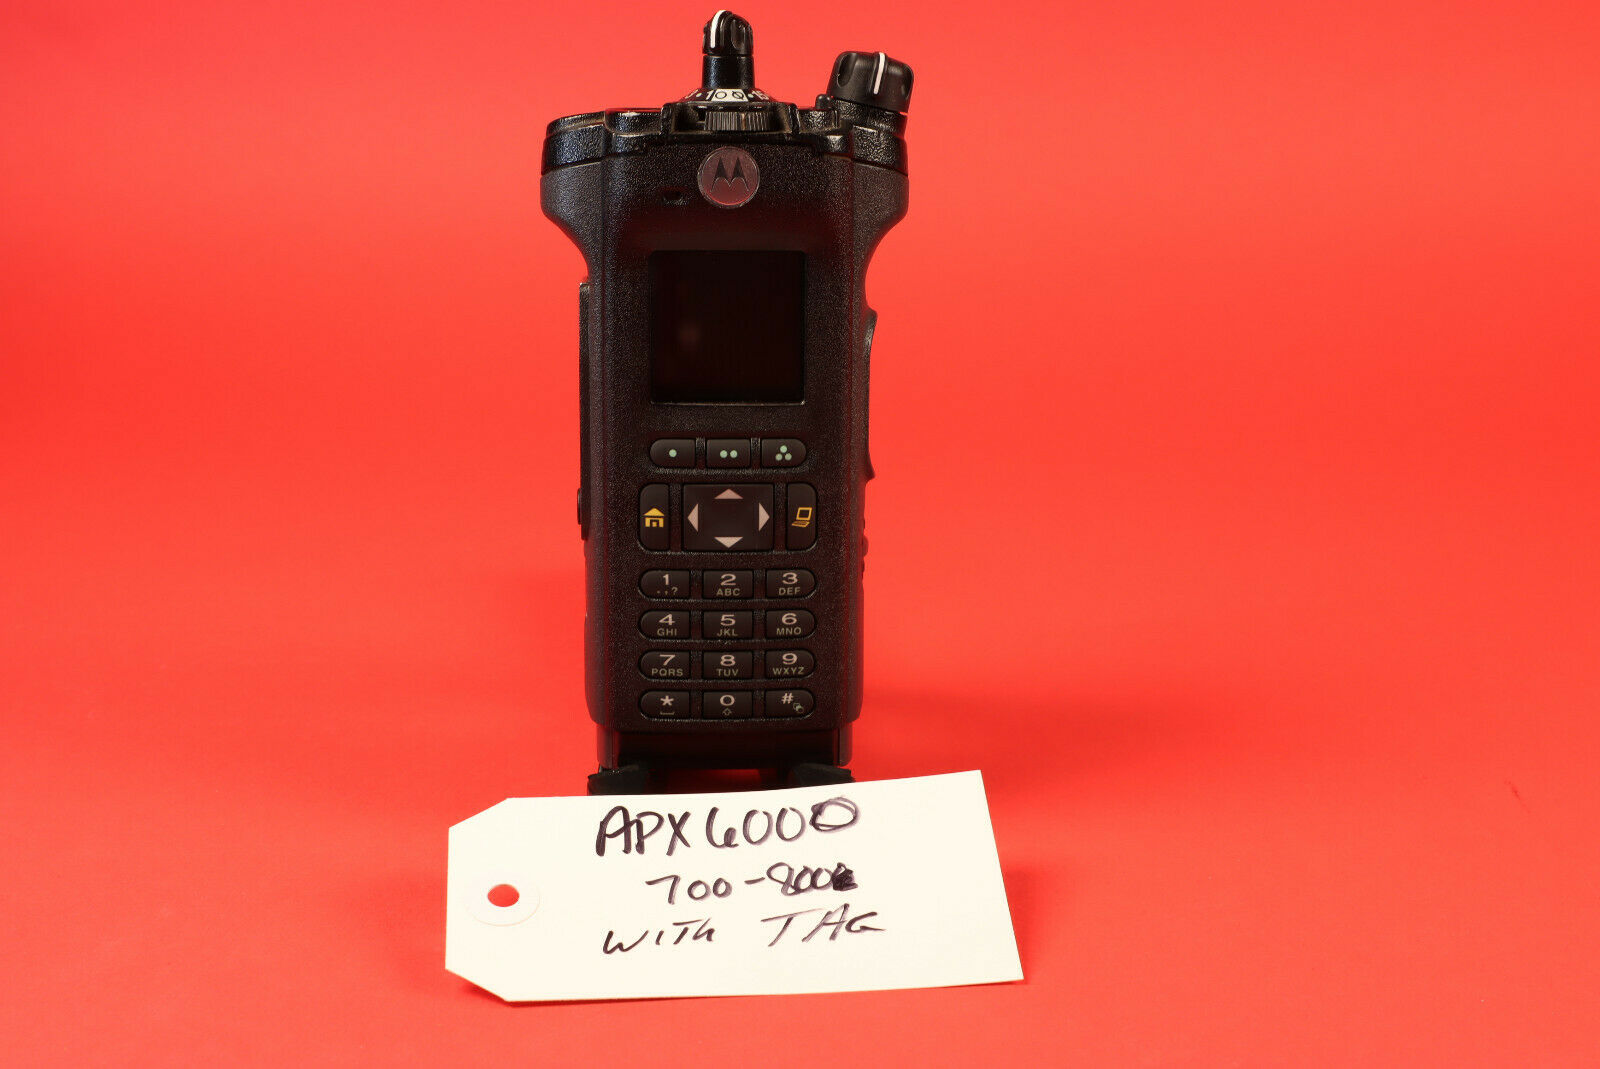 Seller refurbished Motorola APX6000 700/800 Bluetooth AES-256 W/ Tags.